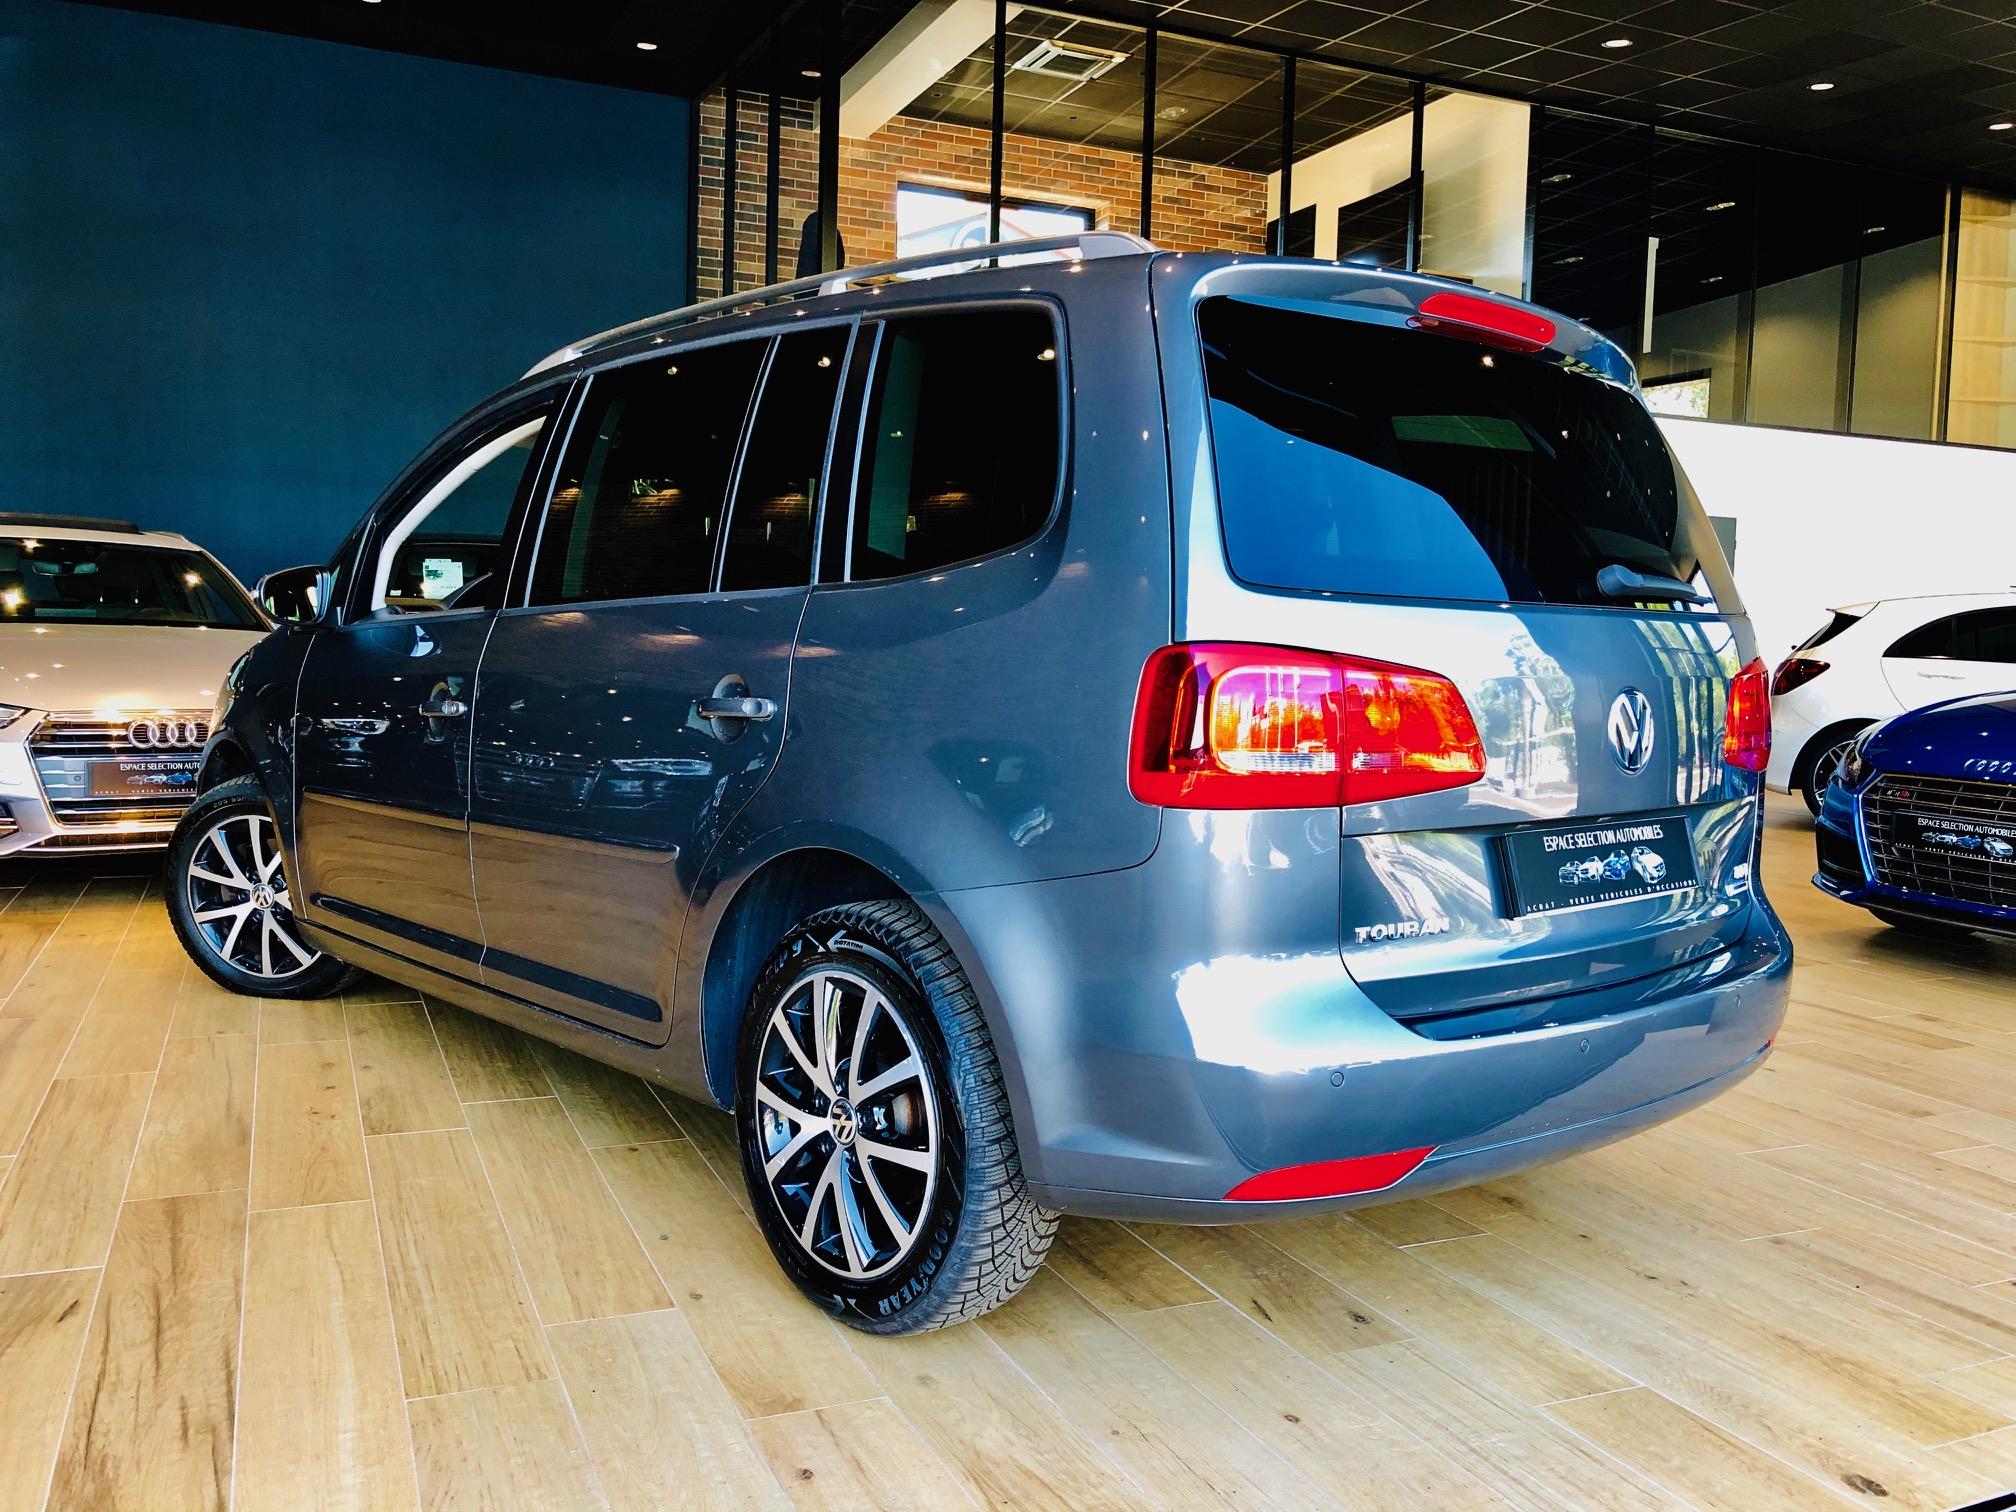 Occasion Volkswagen Touran 1.9 tdi 105cv Face Avant Gauche